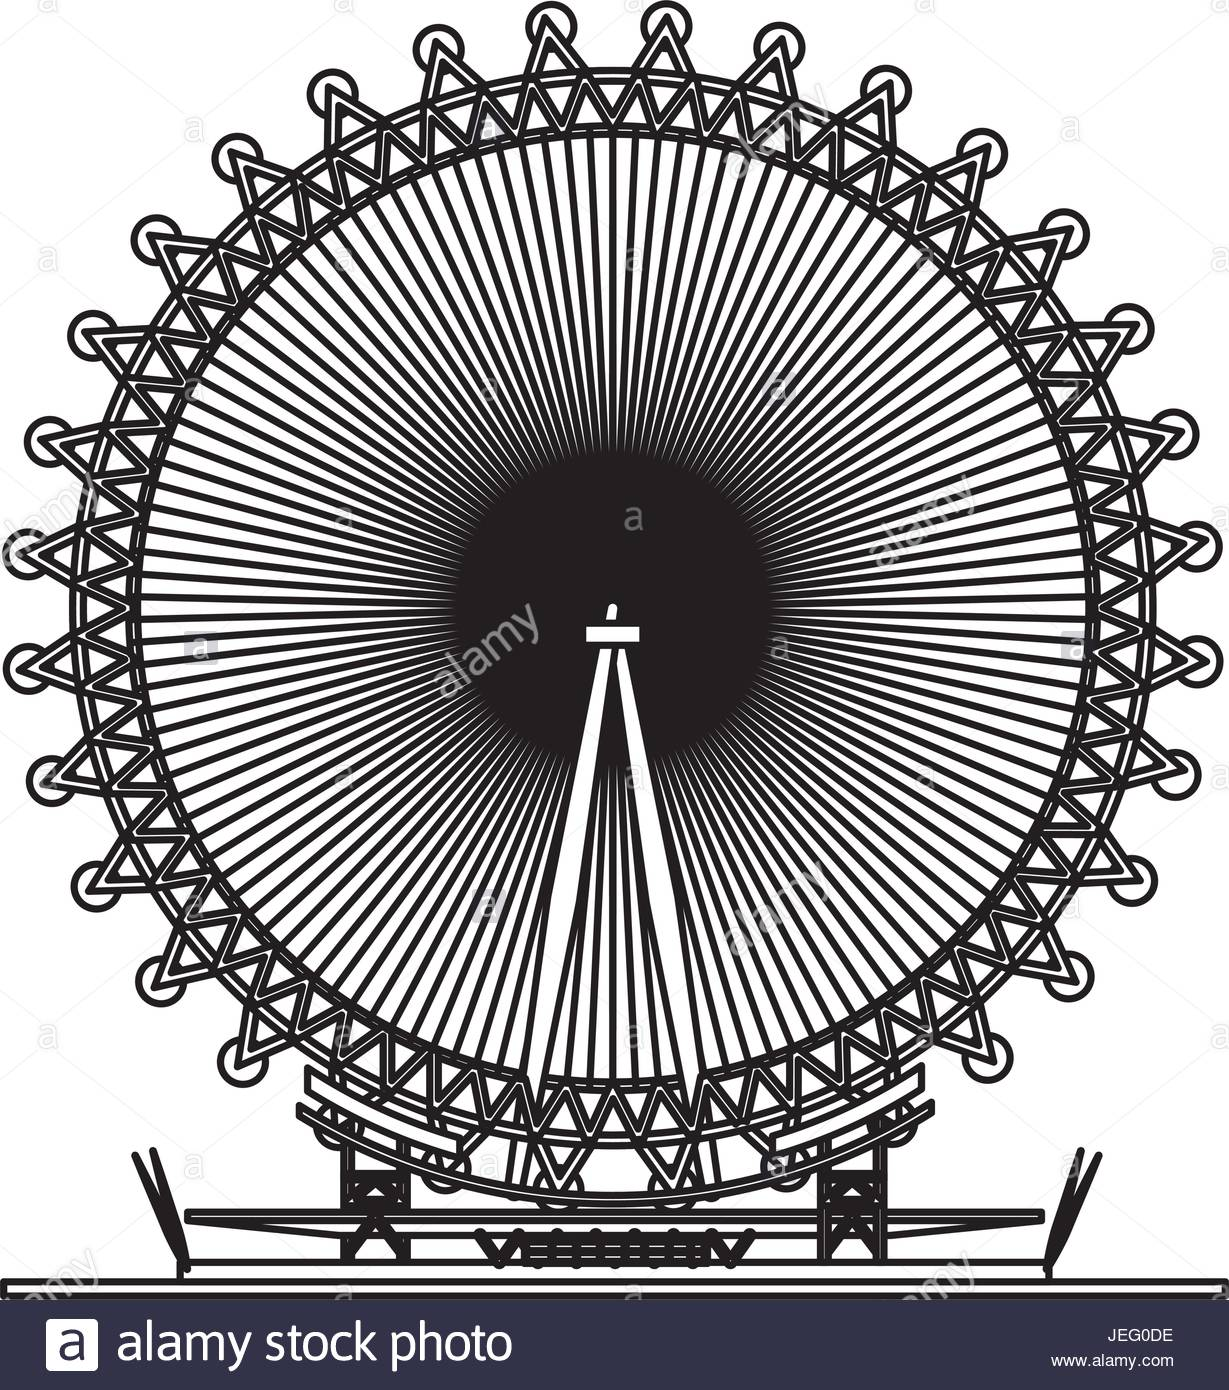 1229x1390 London Eye Symbol Stock Vector Art Amp Illustration, Vector Image